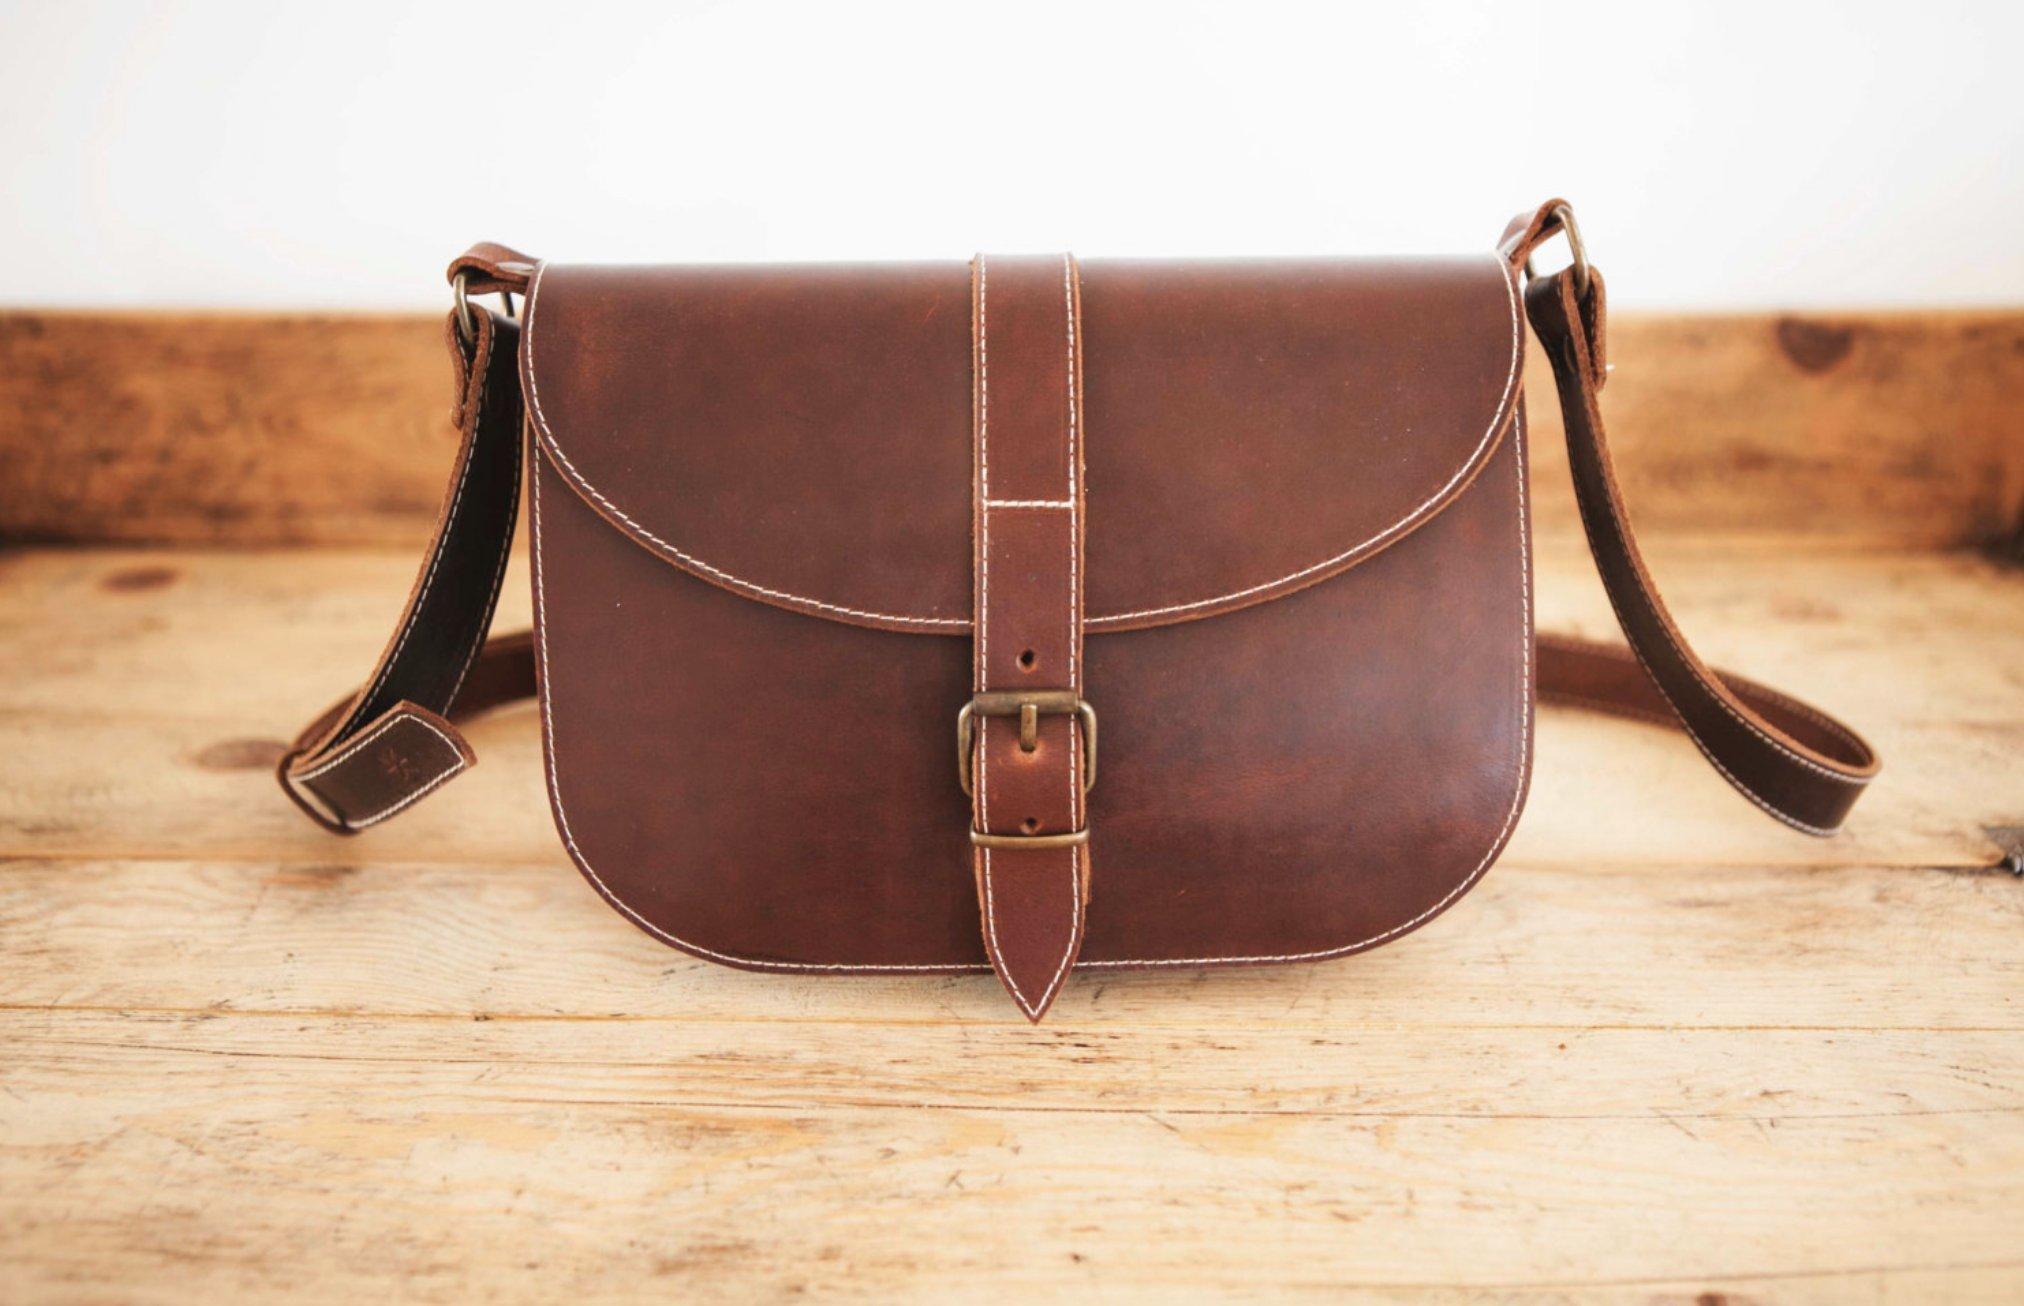 Brown Leather MESSENGER BAG, Messenger Leather bag, Brown messenger bag, Cowhide leather shoulder bag, Leather satchel, leather bag purse